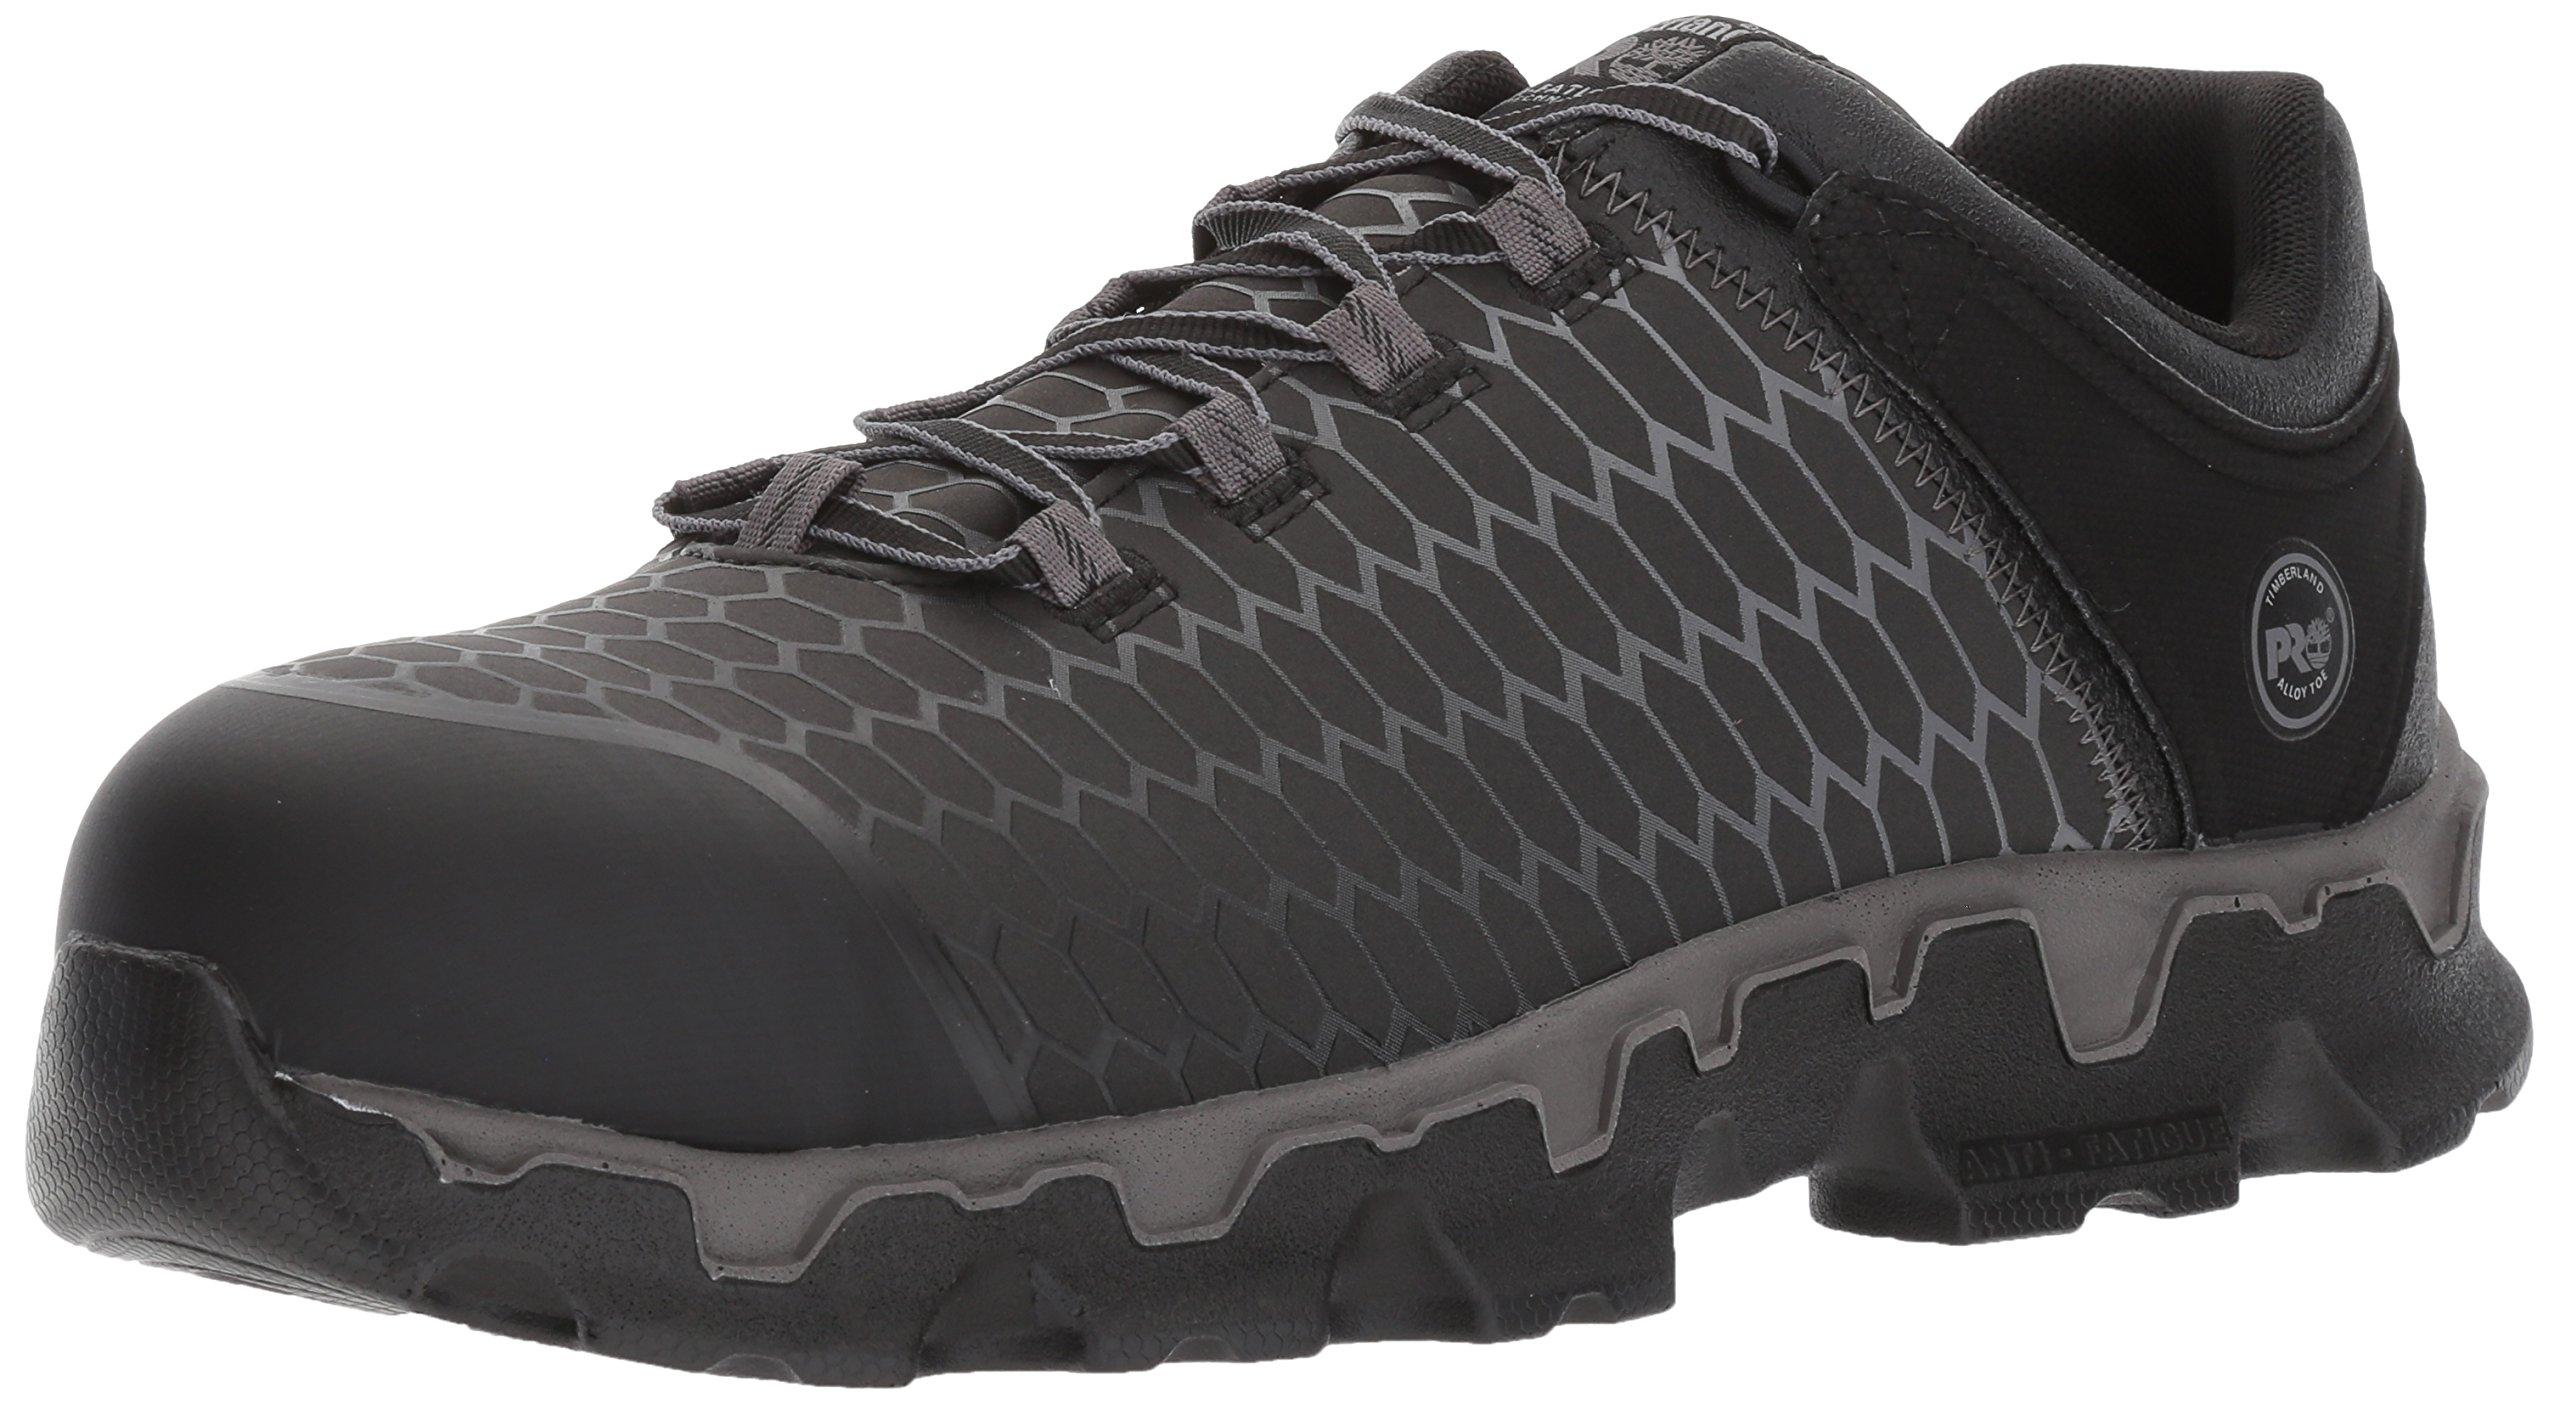 Timberland PRO Men's Powertrain Sport Raptek Alloy Toe EH Industrial and Construction Shoe, Black Raptek, 10.5 M US